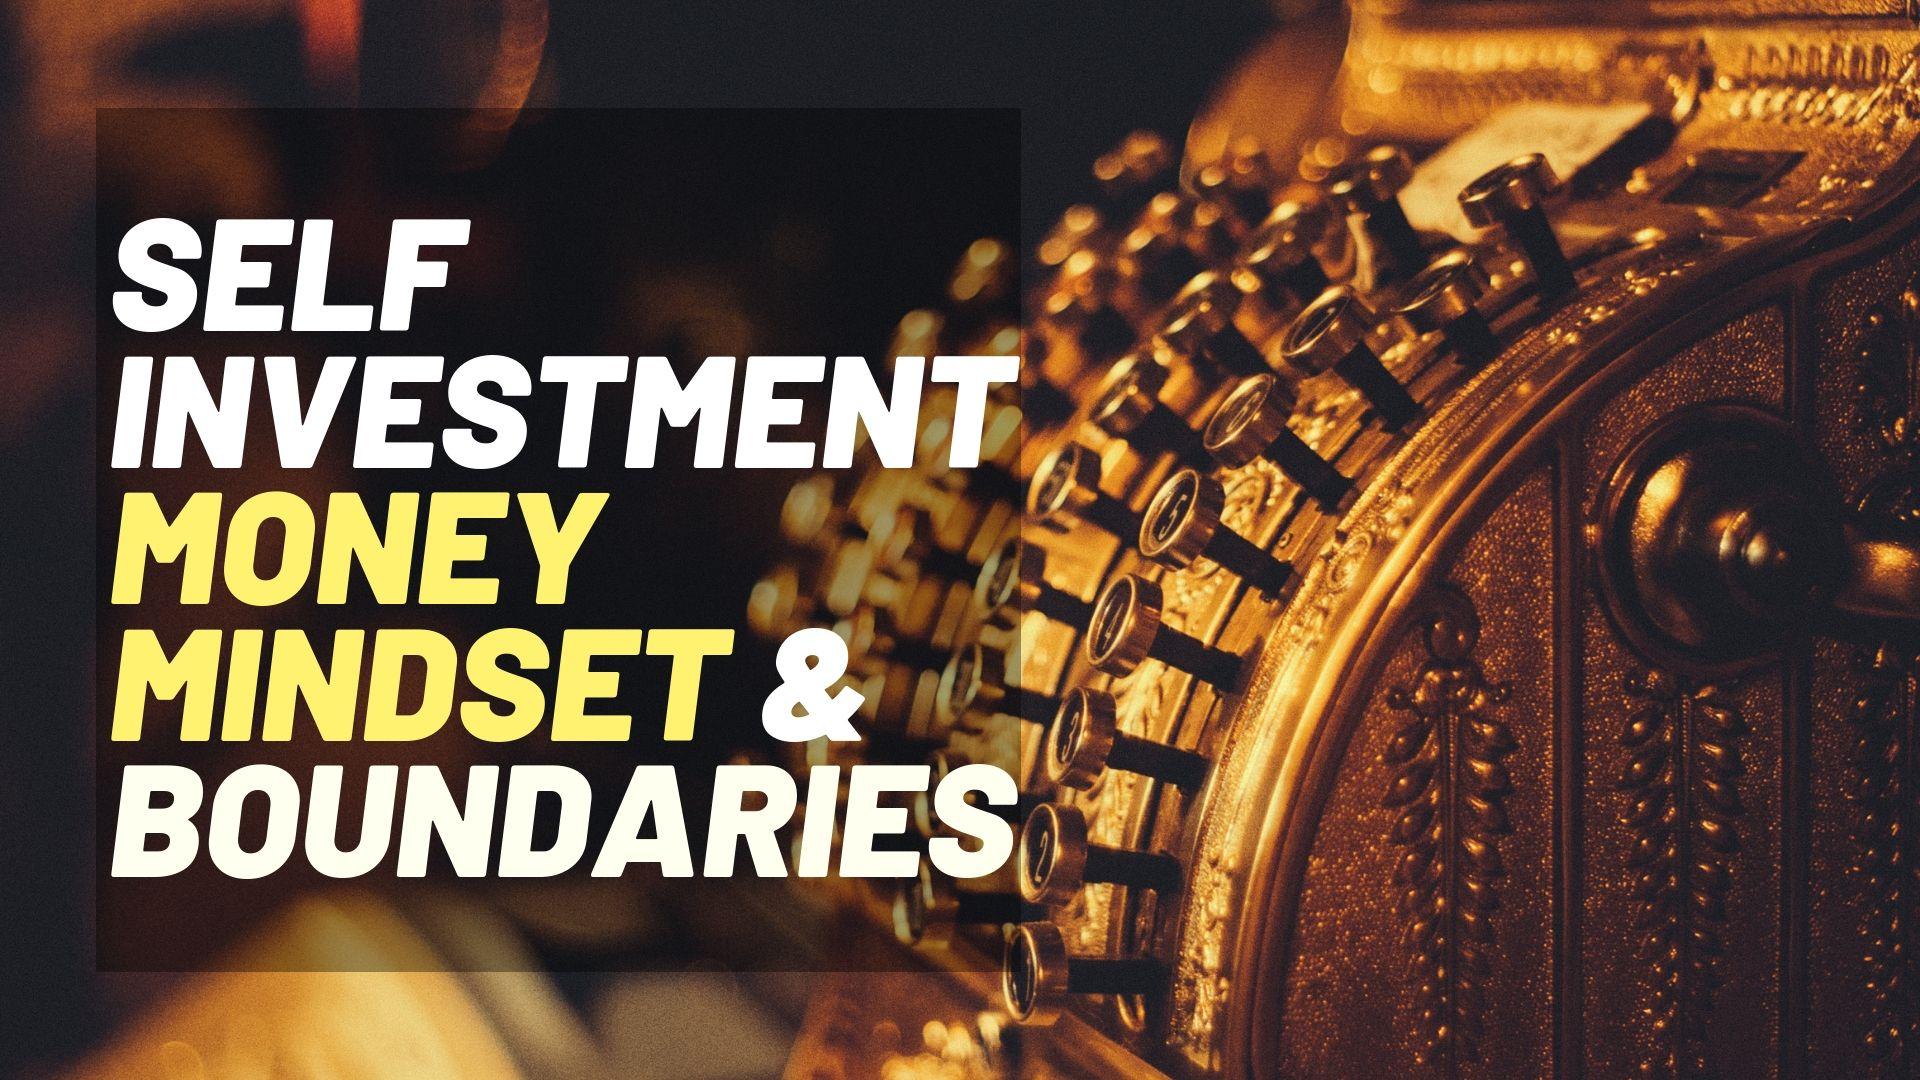 Self investment Money Mindset.jpg